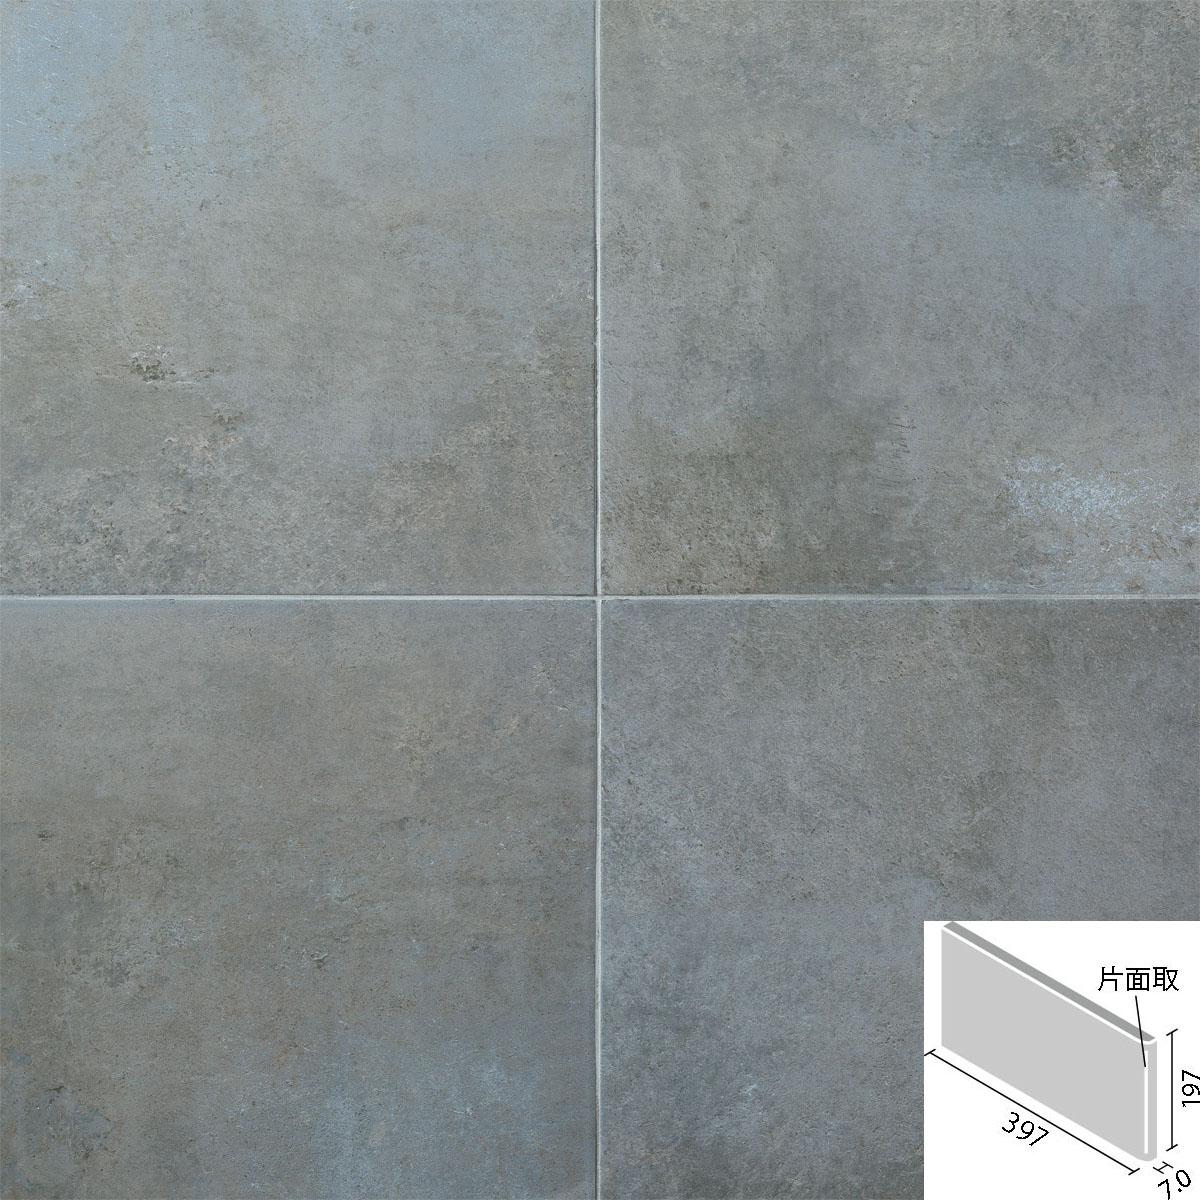 LIXIL(INAX) ビターメタル 400x200mm角片面取(短辺) ID-4260/BMA-2(R)